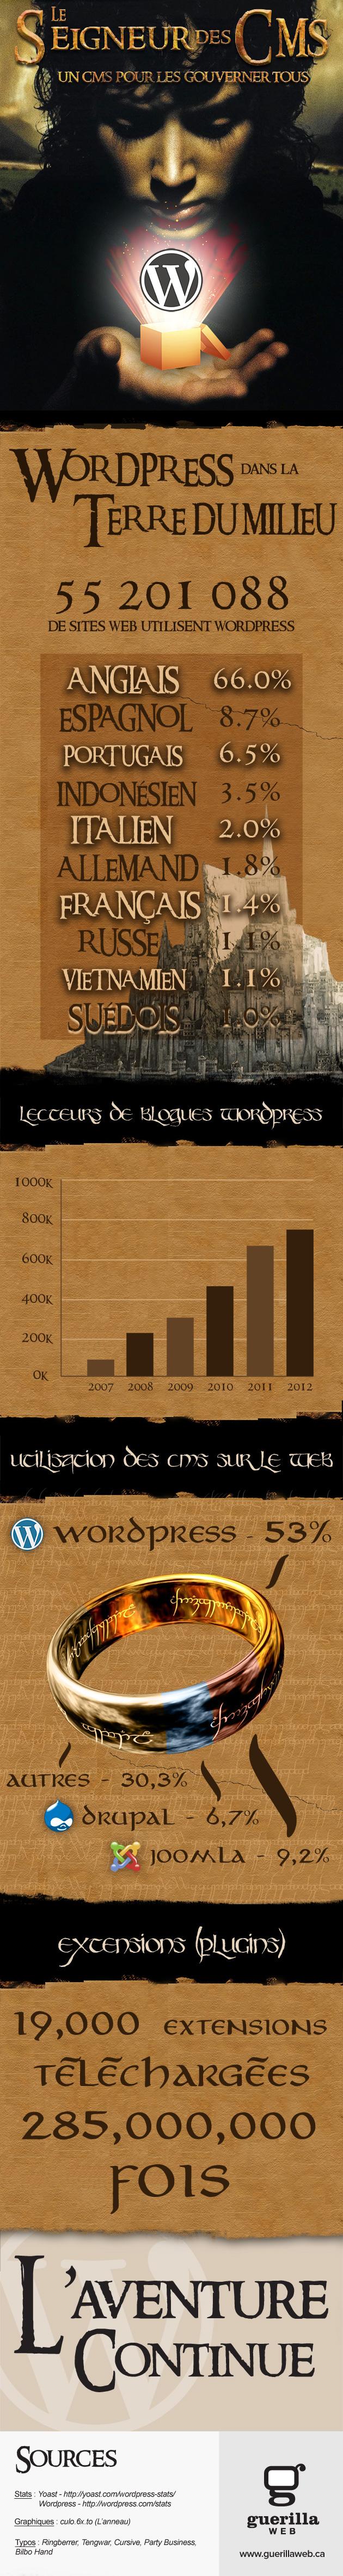 Statistiques du CMS WordPress - Infographie